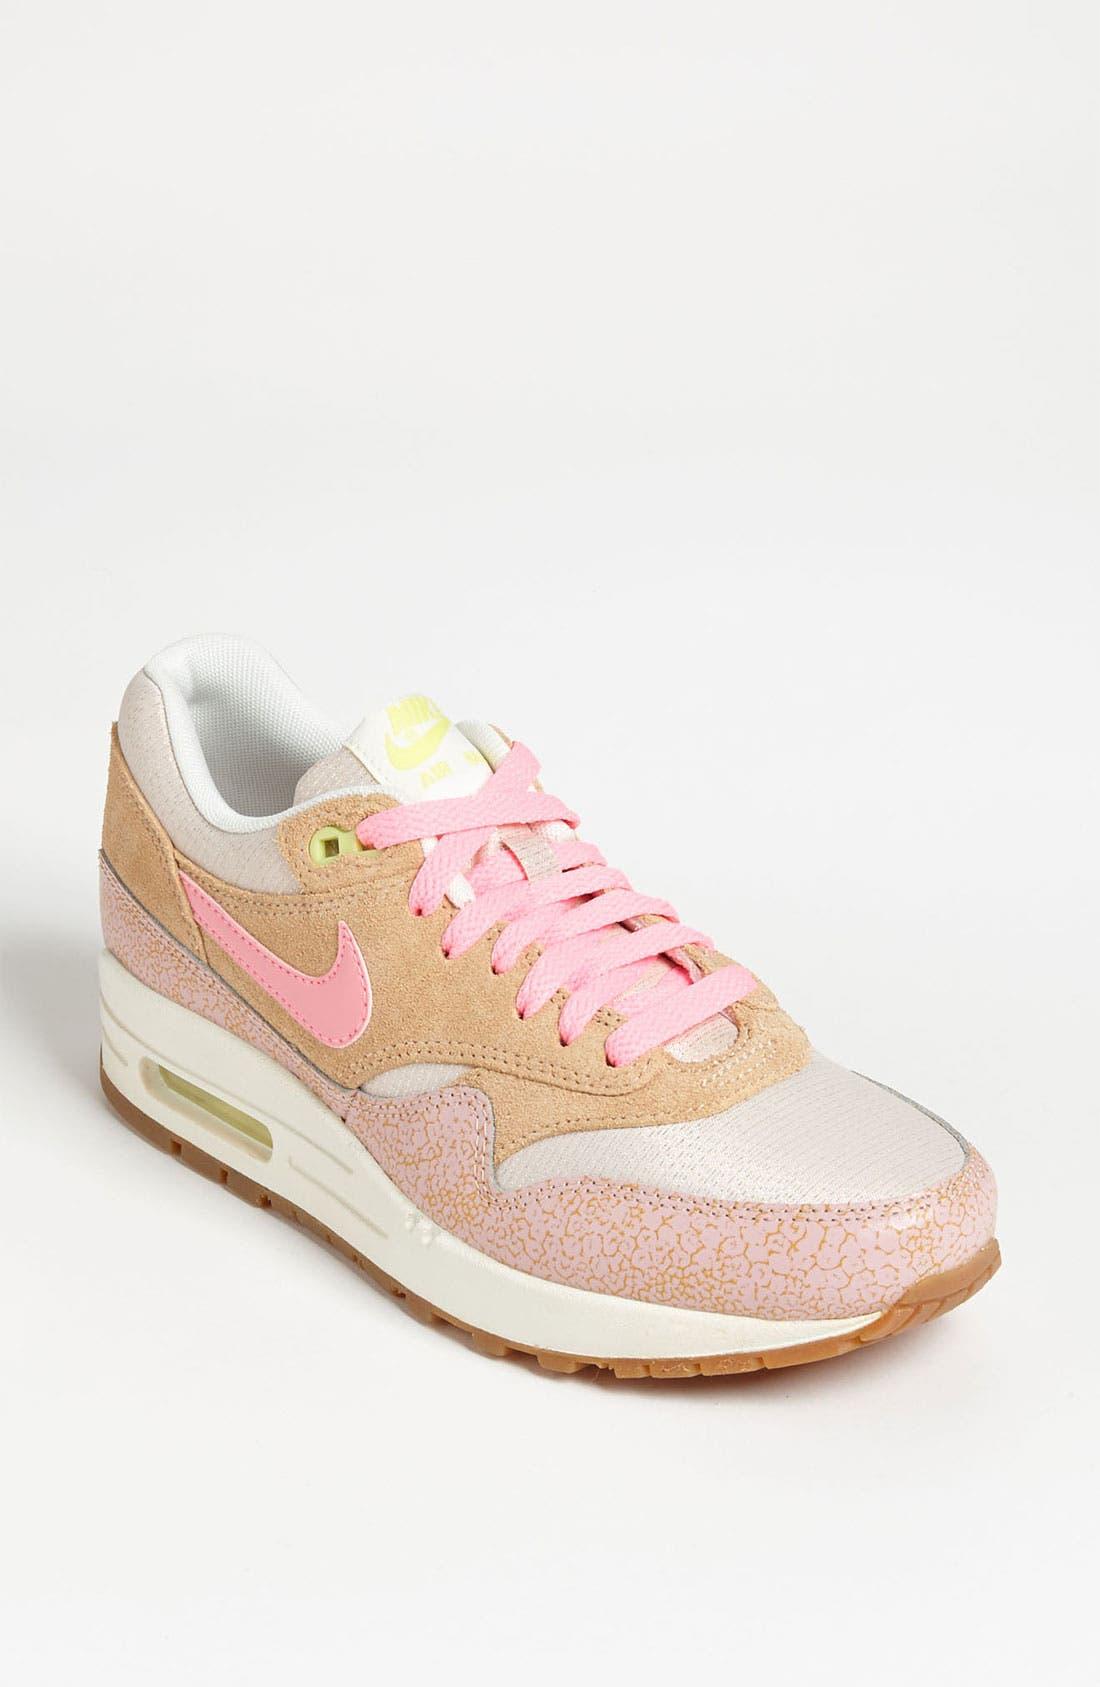 Main Image - Nike 'Air Max 1 Vintage' Sneakers (Women)